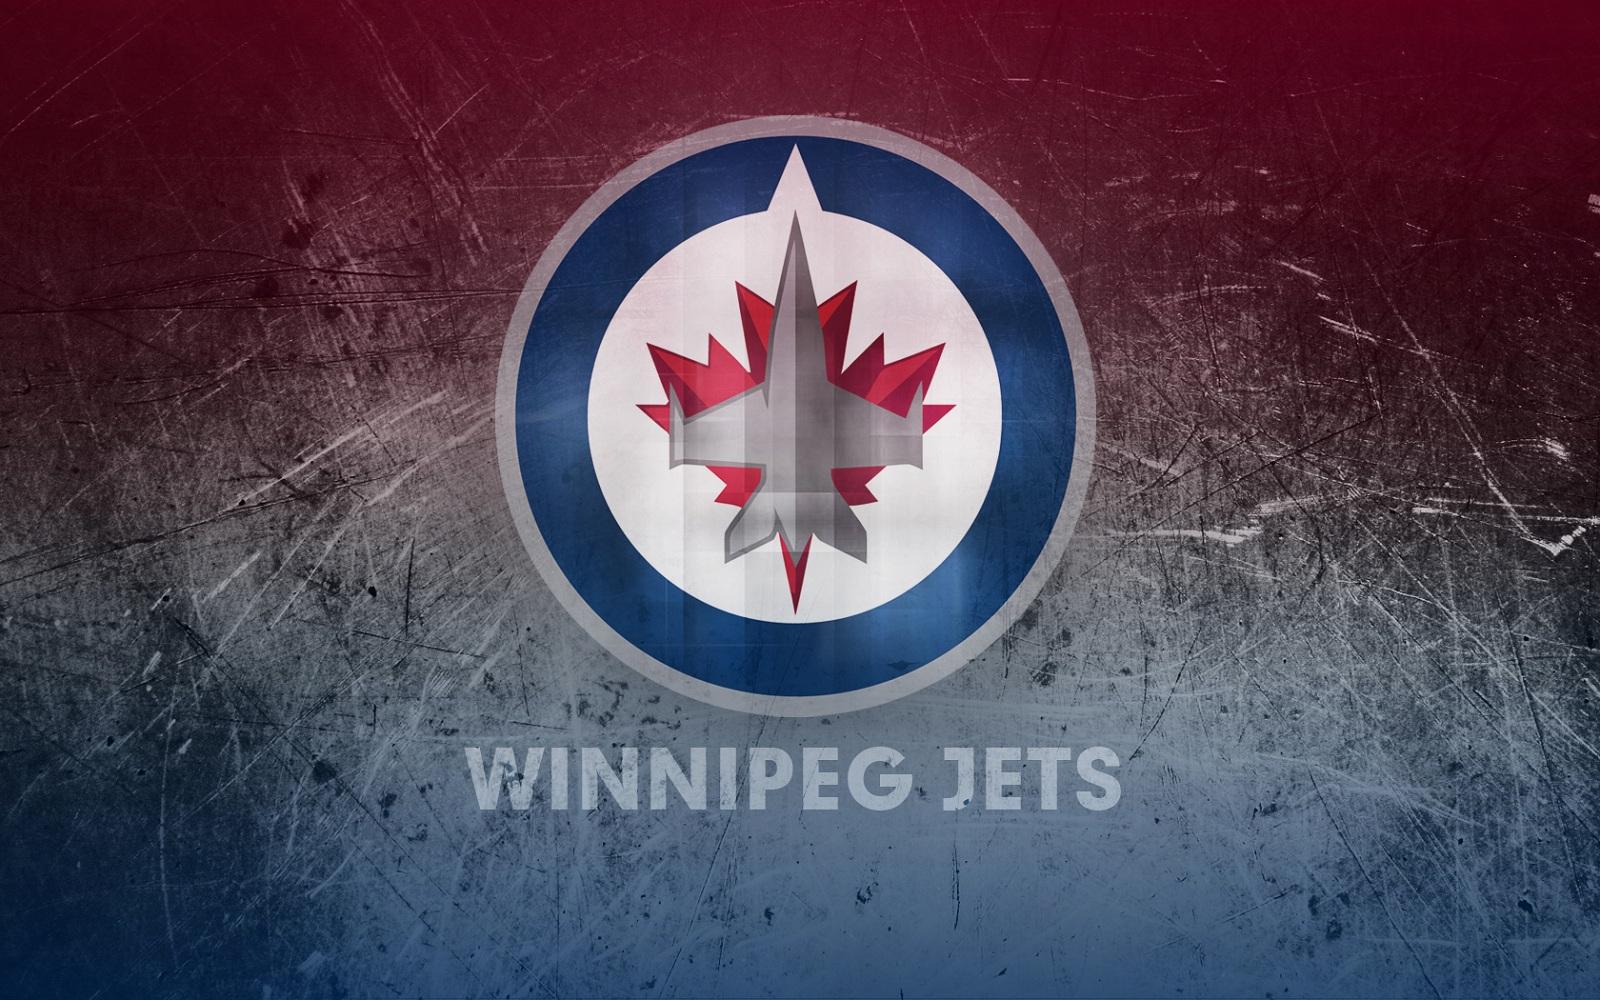 hockey Winnipeg Jets wallpaper background 1600x1000